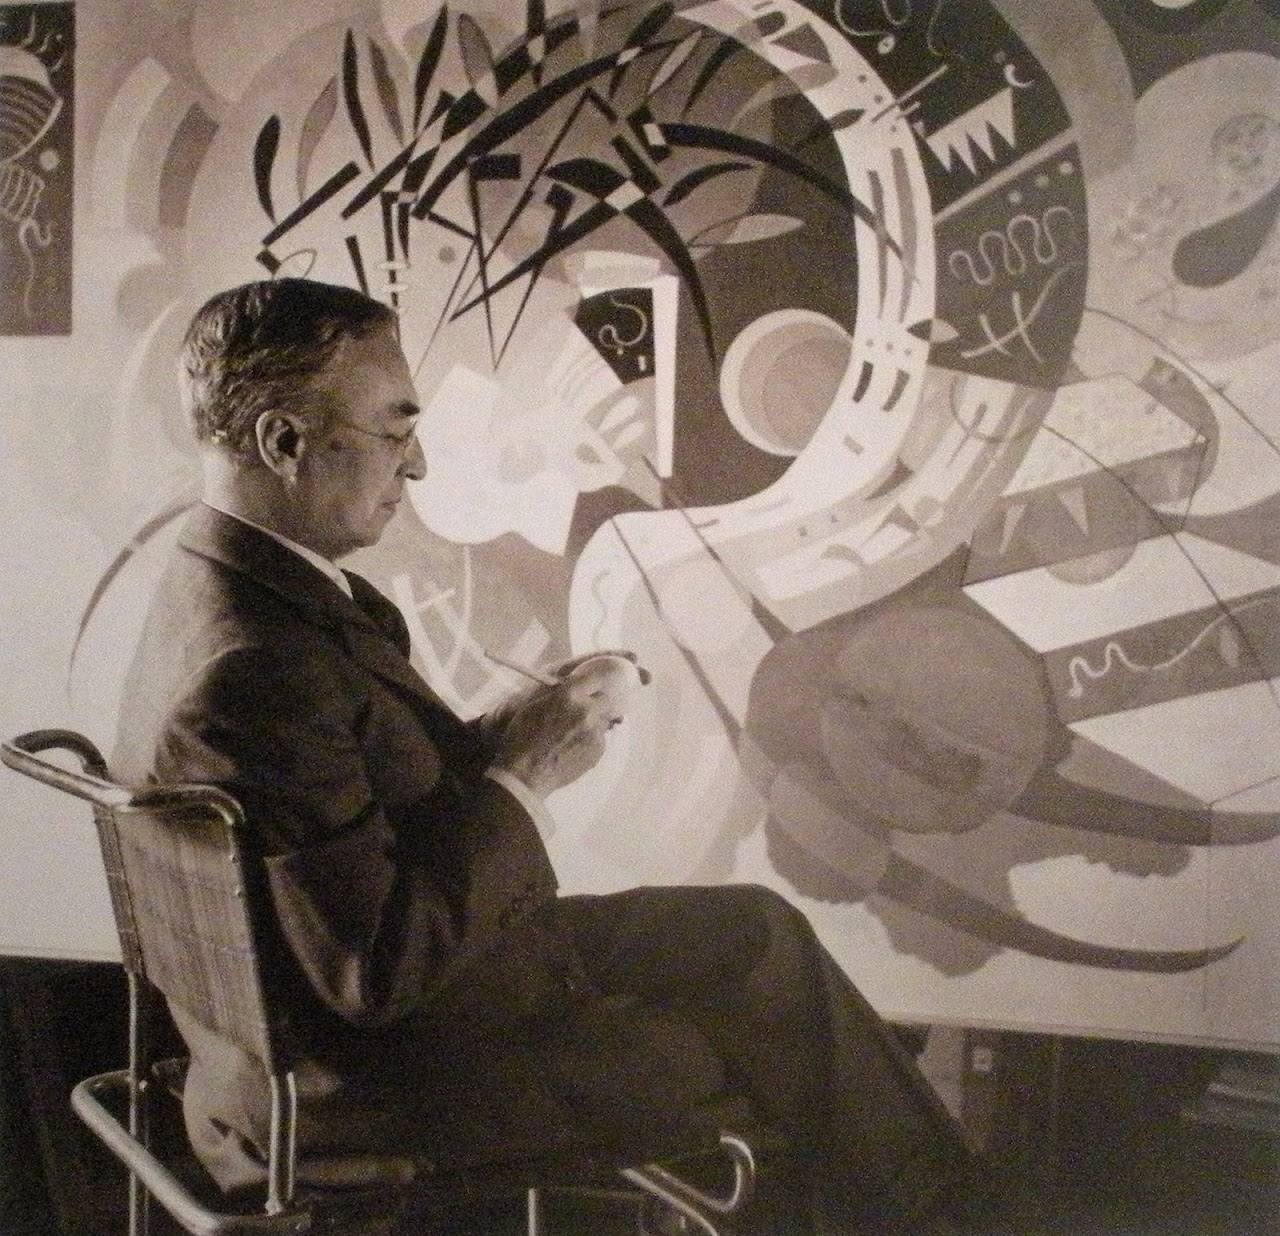 http://4.bp.blogspot.com/-lwIirR7tNtA/TxmVfq4cV3I/AAAAAAAAAsQ/IphDaJoU5Z4/s1280/011-Kandinsky+in+front+of+his+work%252C+Dominant+Circle+%255BCourbe+dominante%255D%2529%252C+1936.jpg